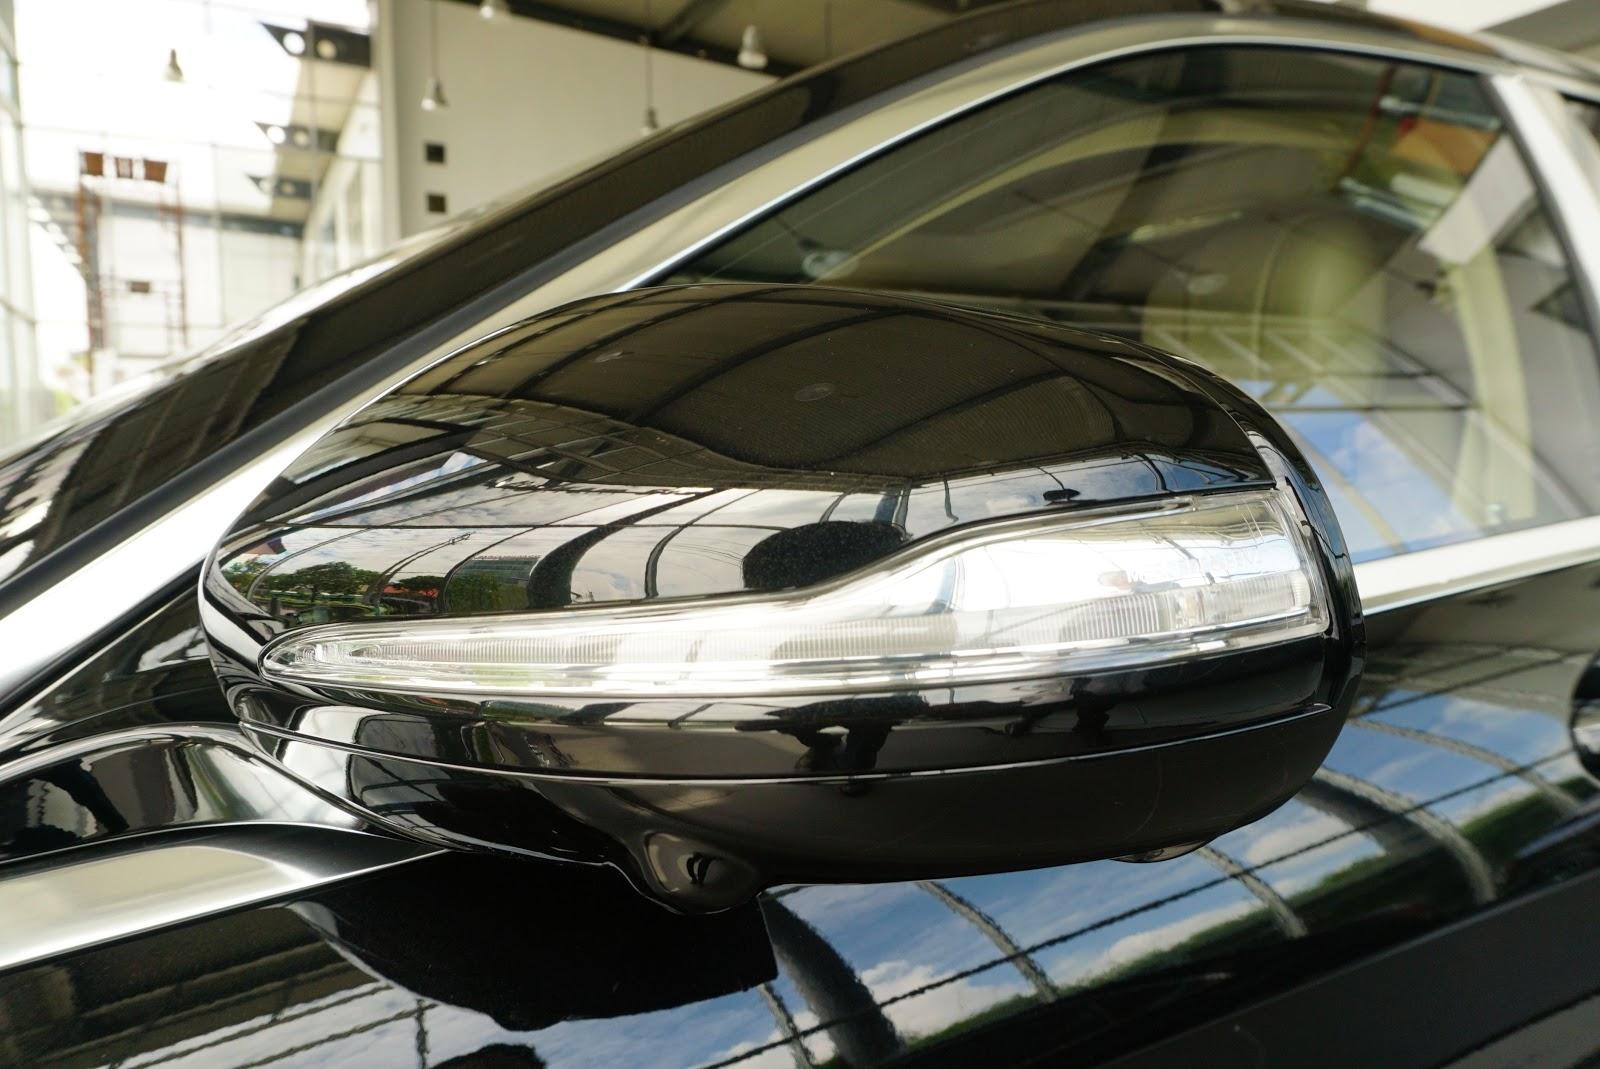 Ngoại Thất Xe Mercedes Benz S600 MAYBACH Màu Đen a07